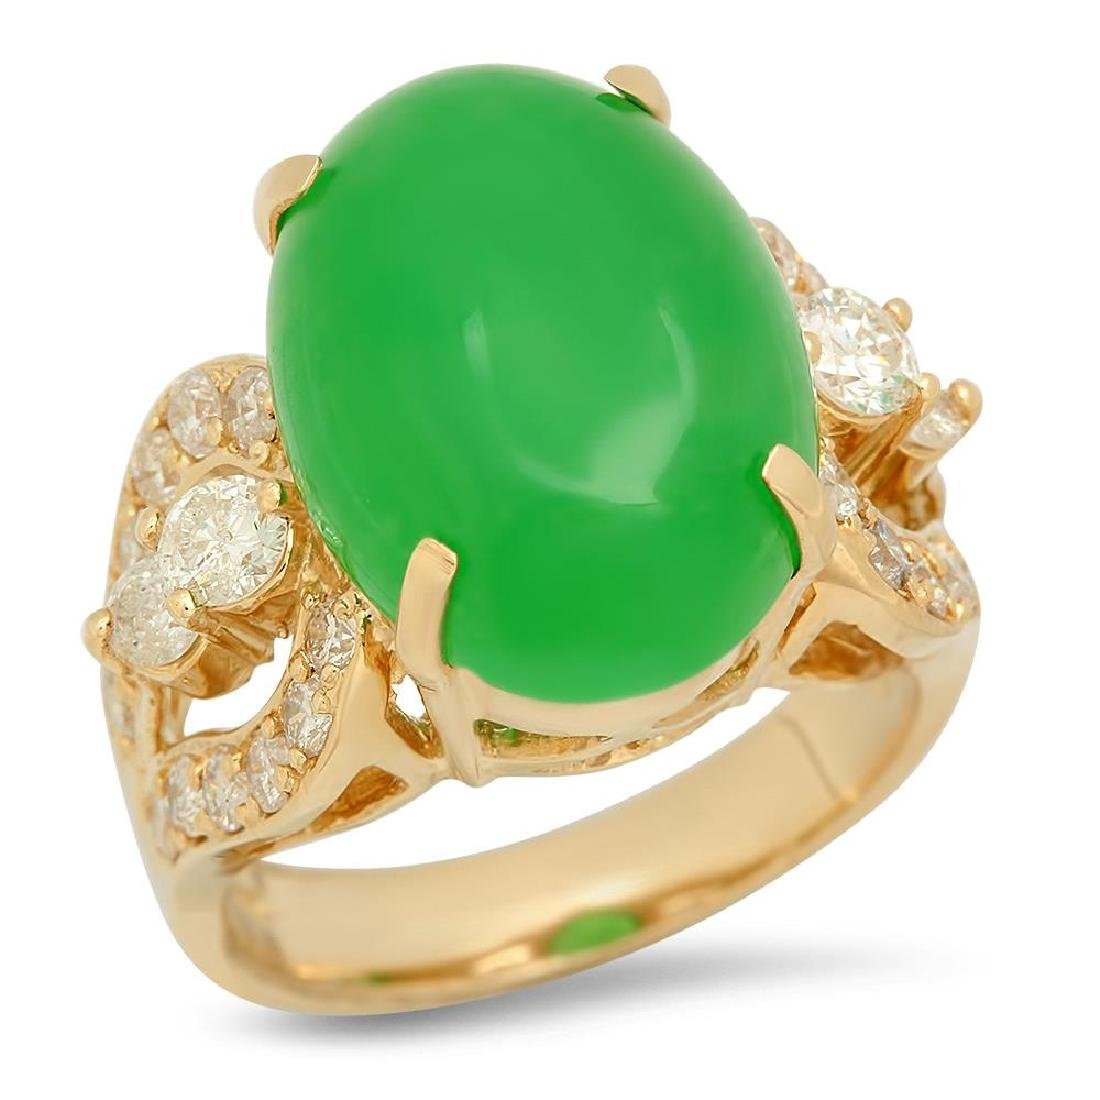 14K Gold 9.38ct Jadeite 1.25cts Diamond Ring